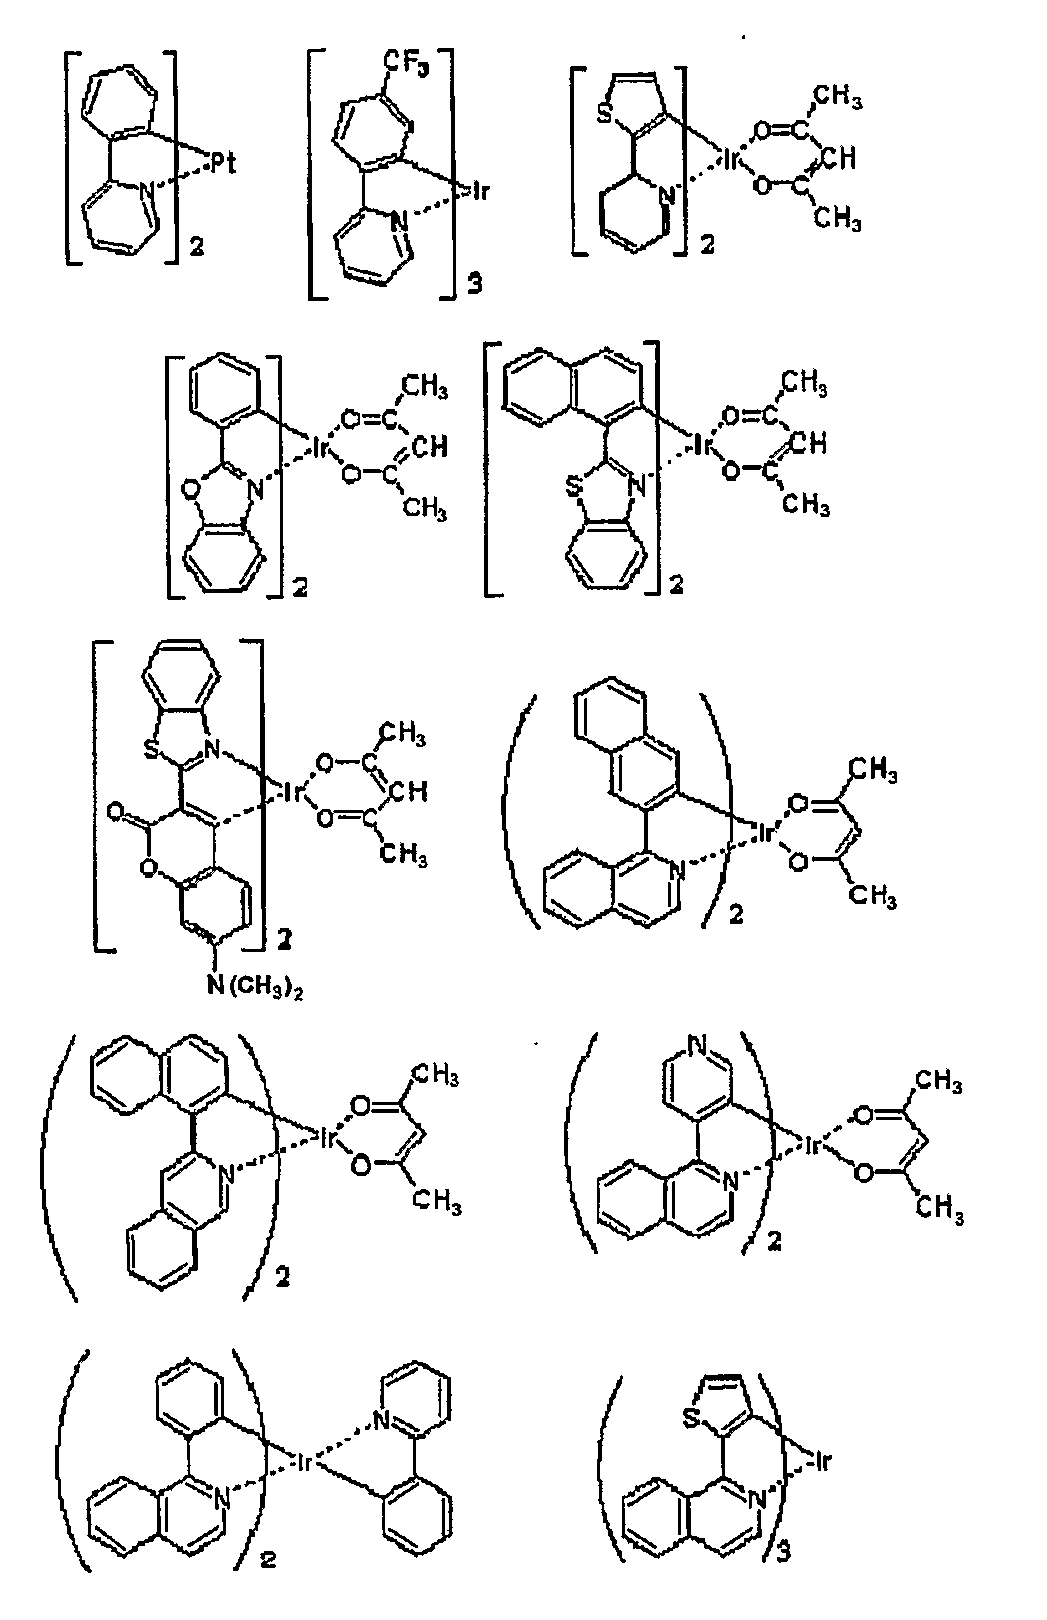 Figure WO-DOC-CHEMICAL-19